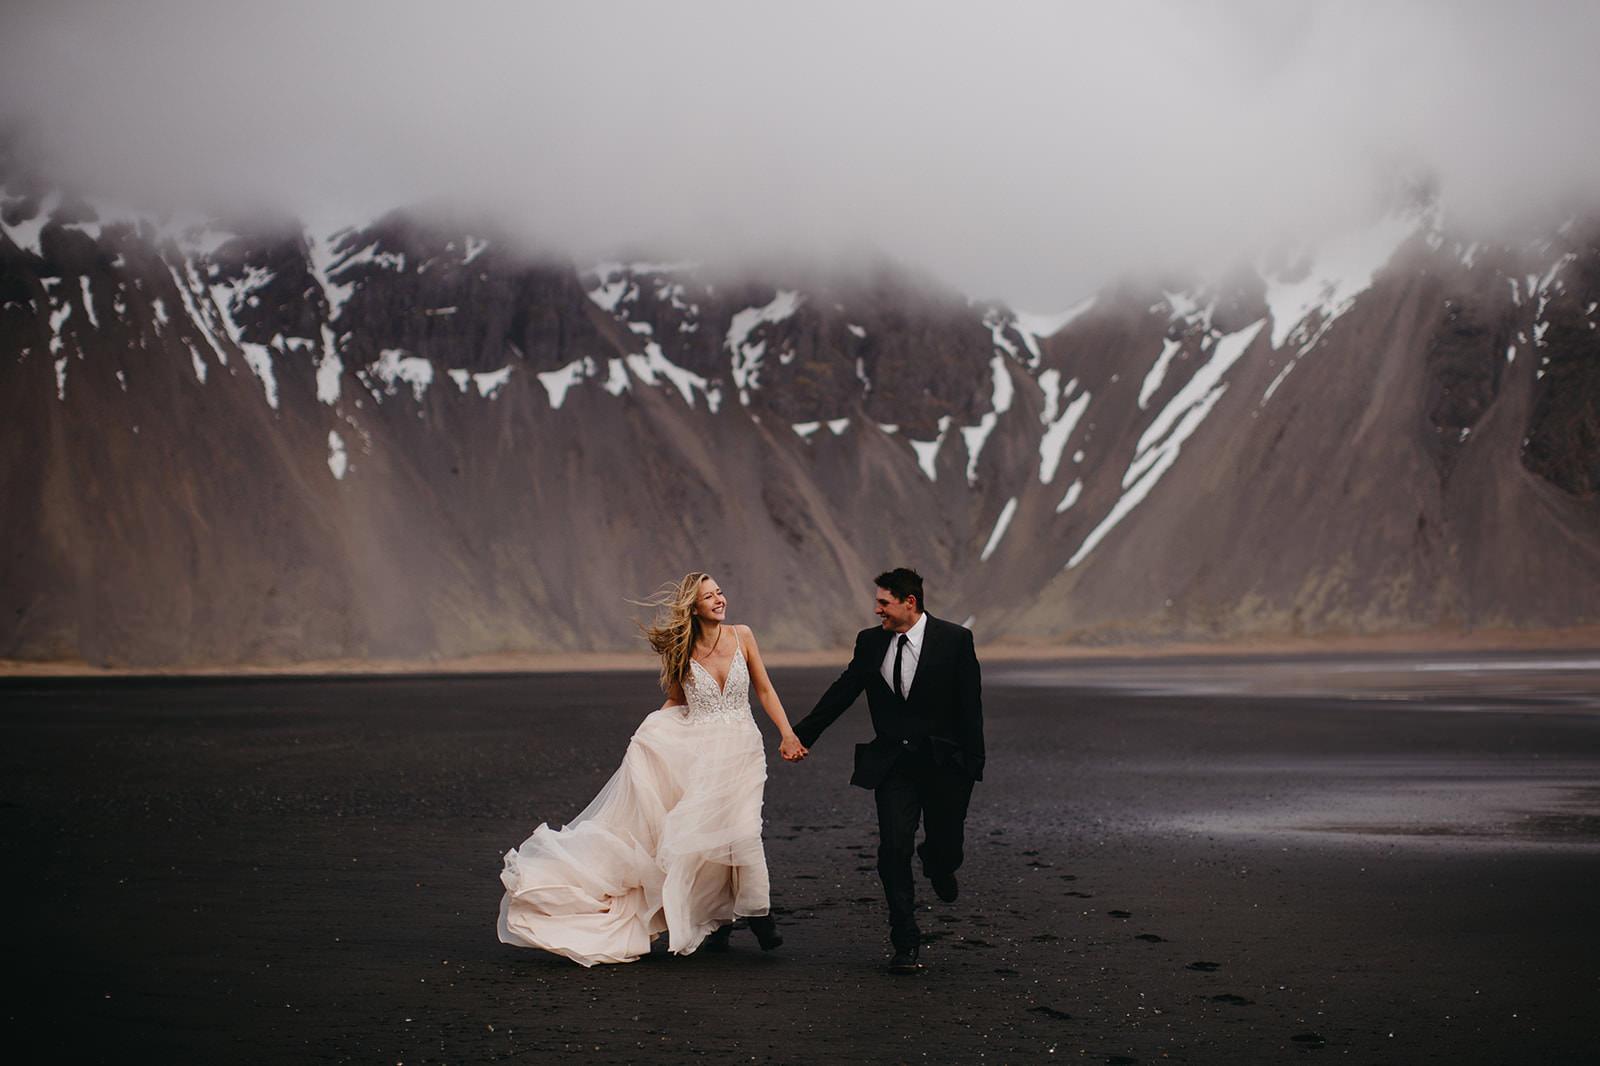 Icelandic Iceland Elopement Wedding Elope Photographer Eloping Reykjavík Vik Black Sand Beach Jökulsárlón Skogafoss Waterfall Vestrahorn Mountain Liz Osban Photography Destination 39.jpg